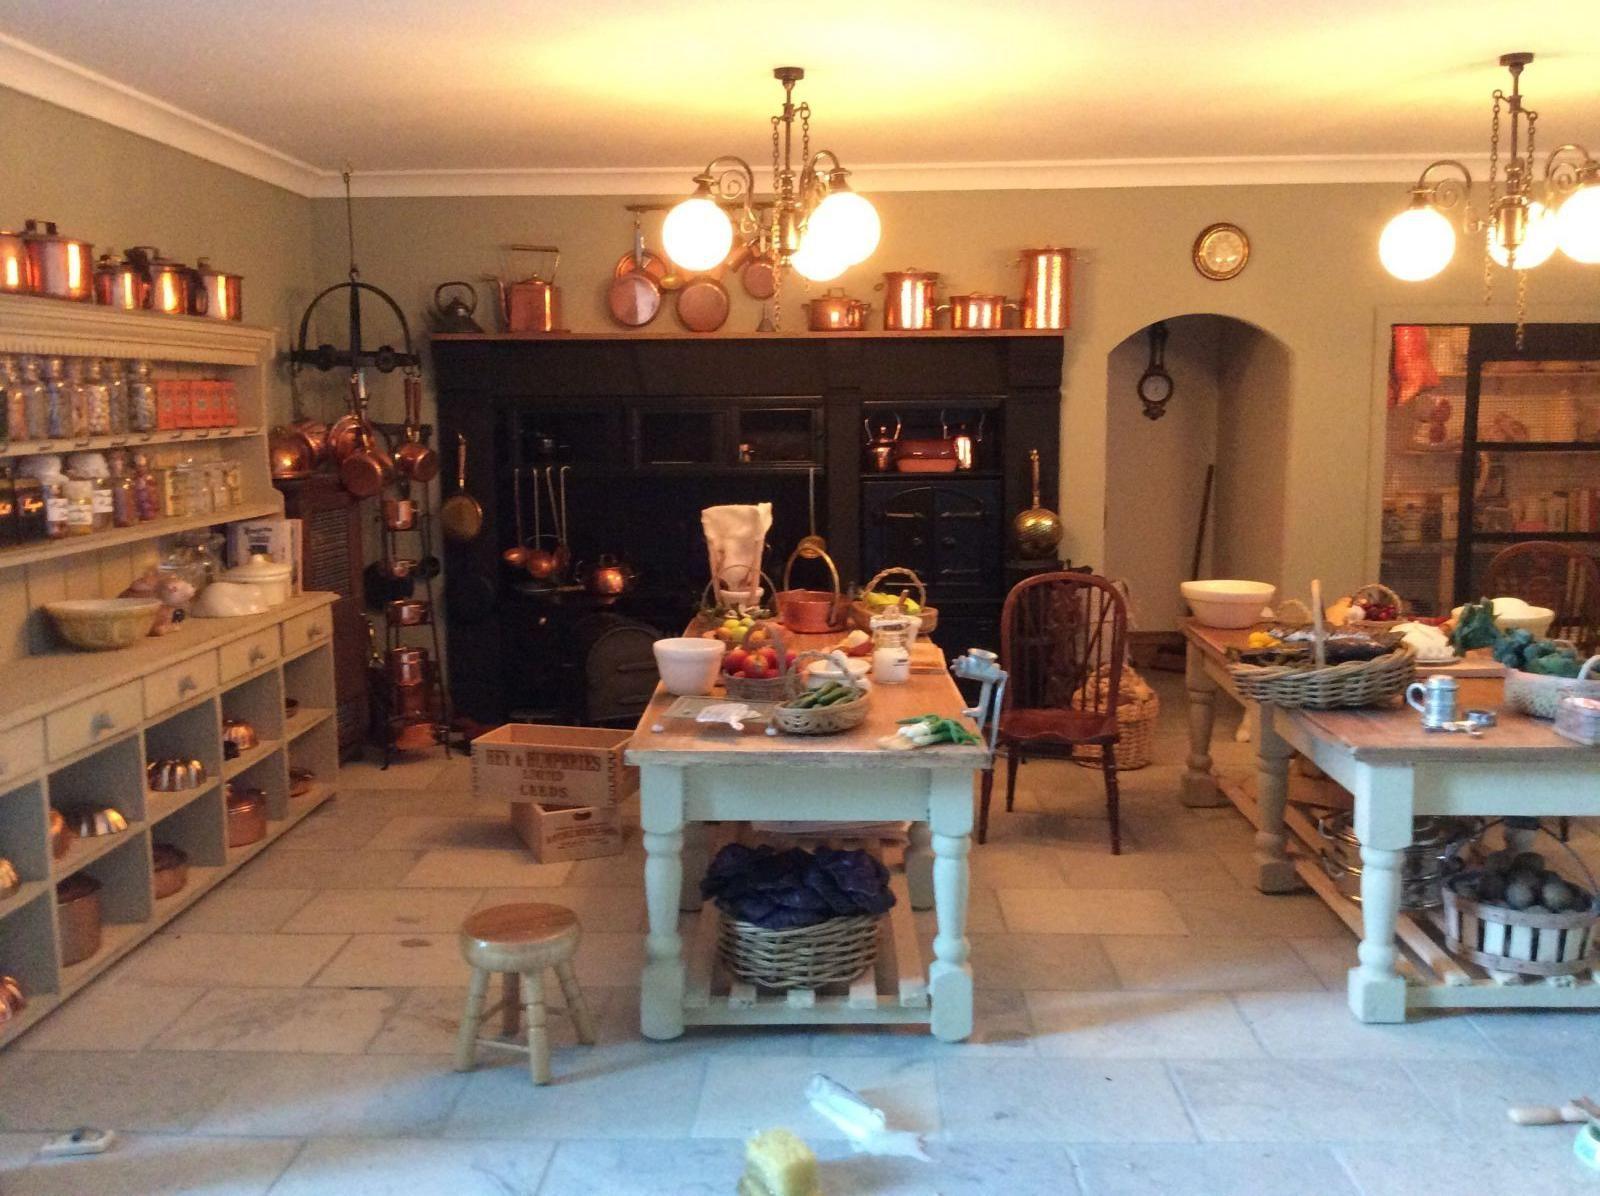 Downton Abbey Based Kitchen Designdolls House Grand Designs Classy Downton Abbey Kitchen Design Design Ideas